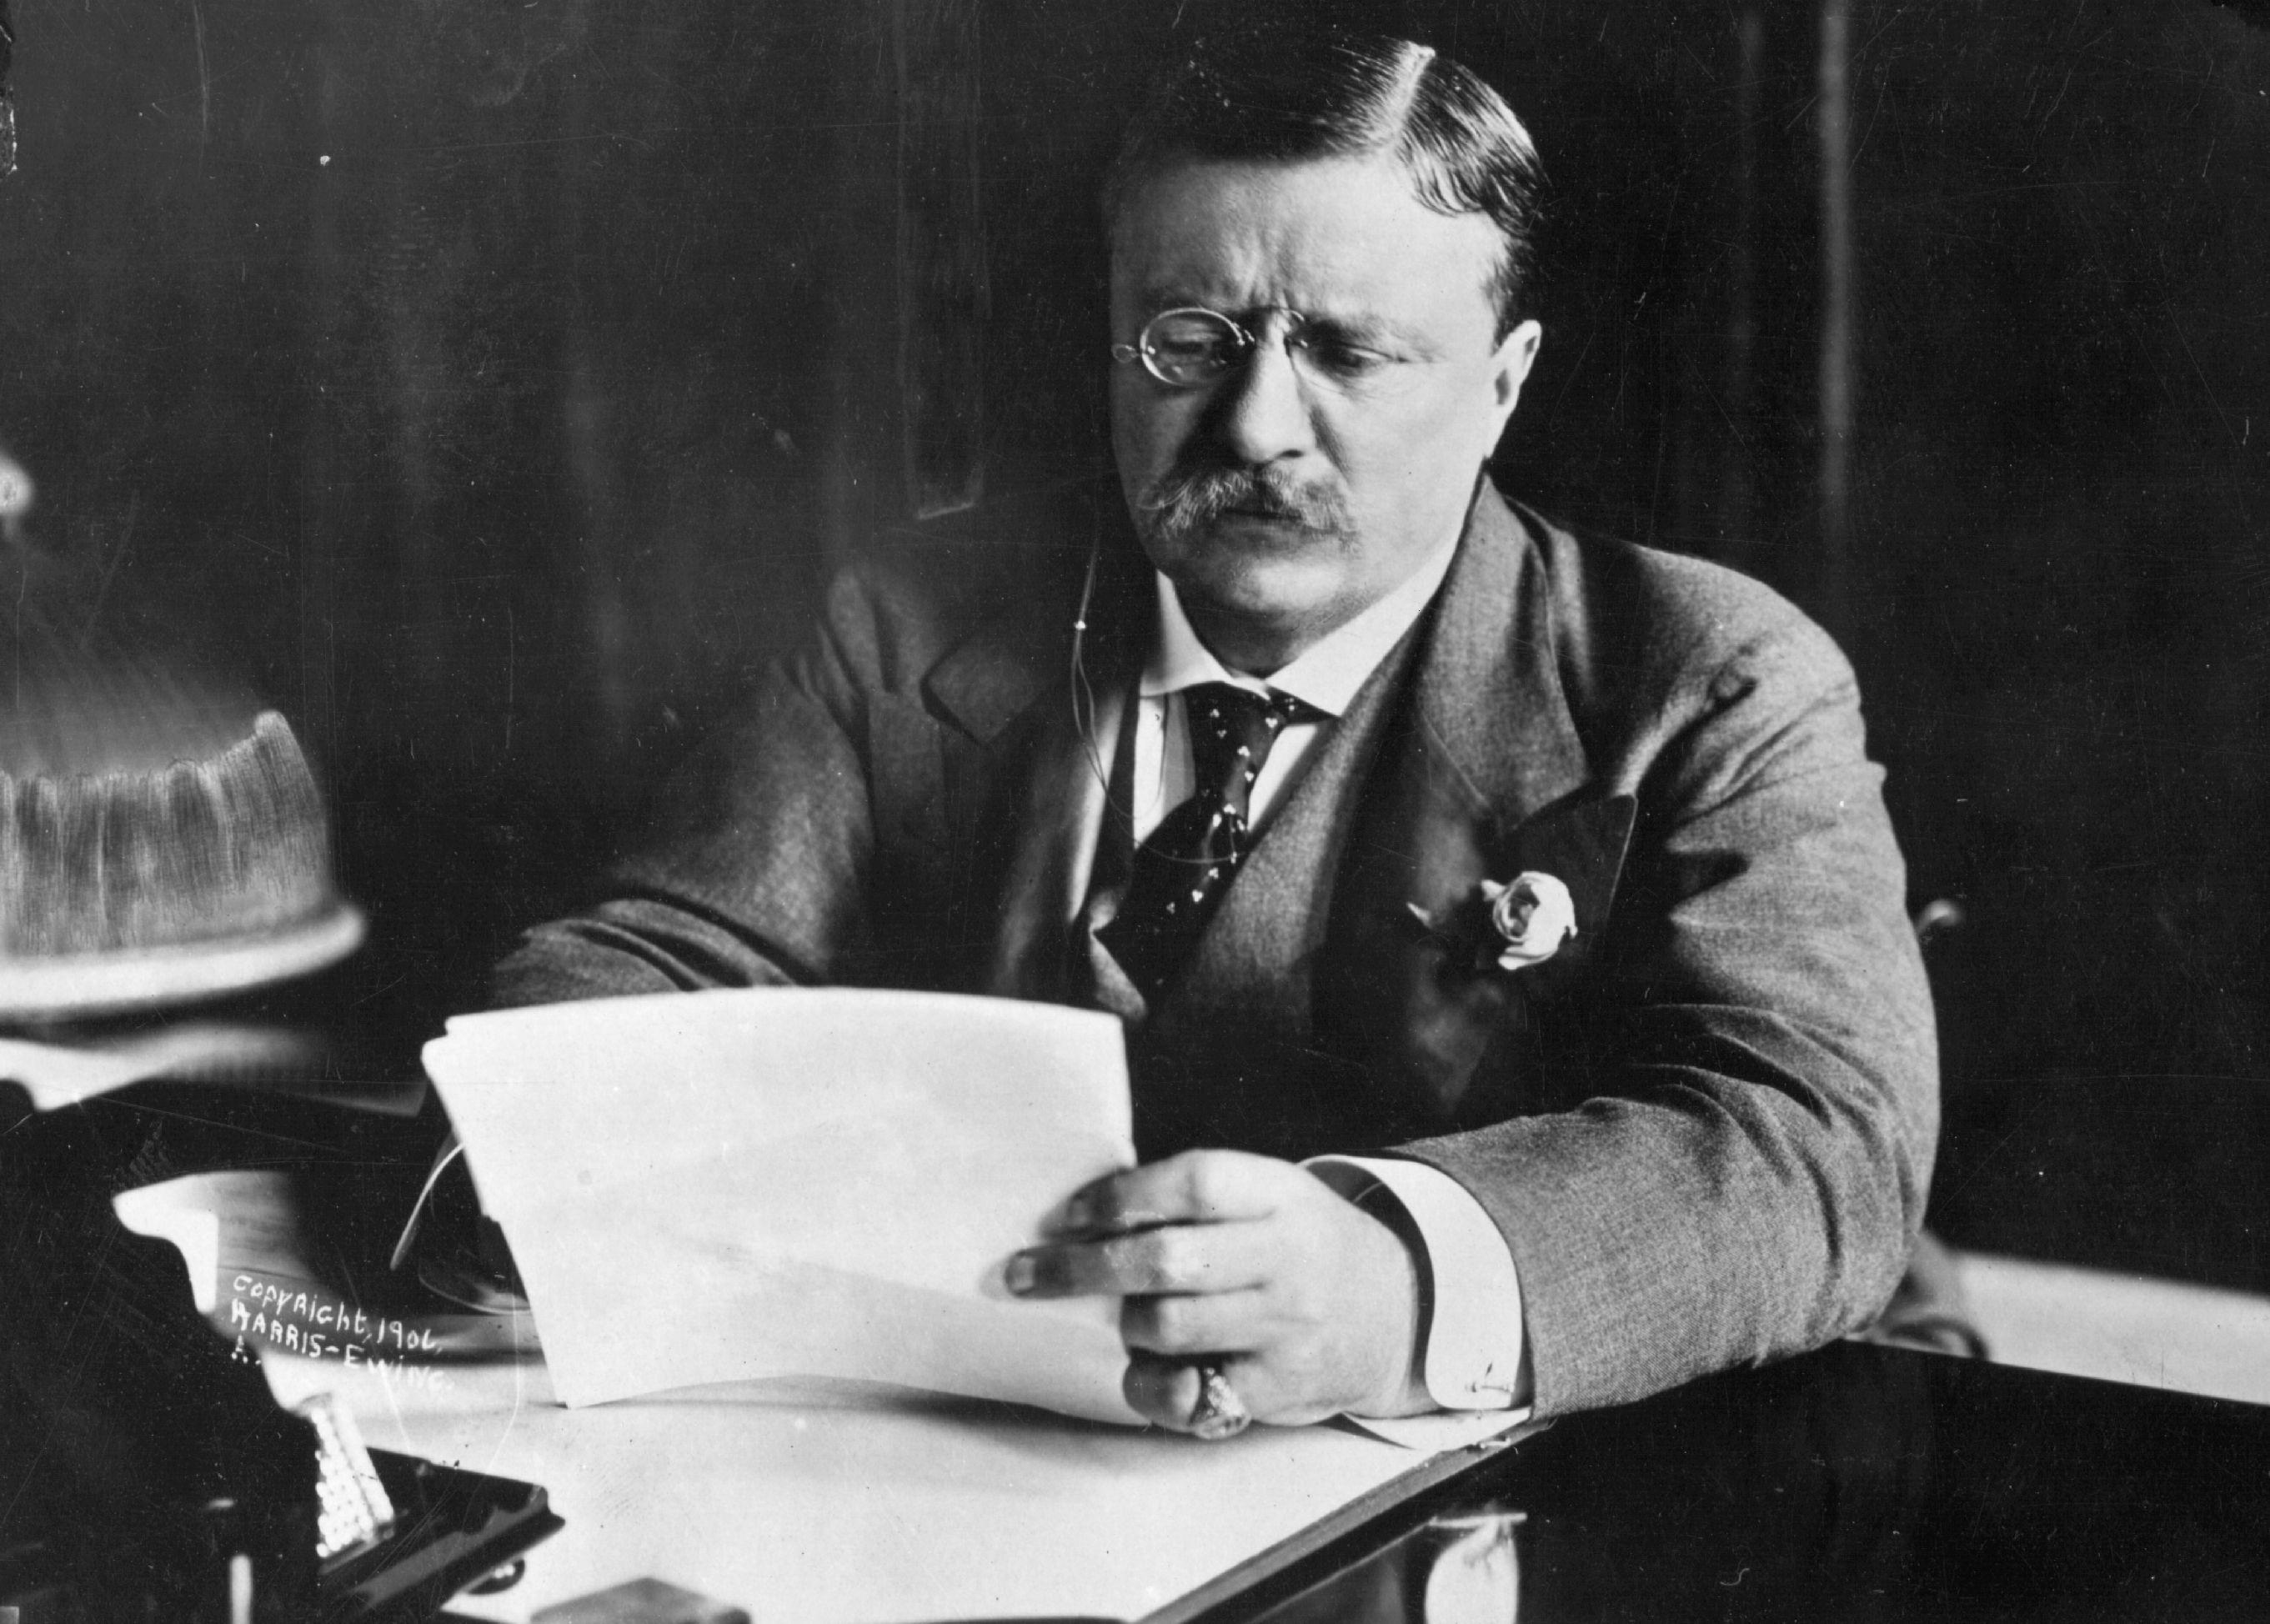 President Theodore Roosevelt Biography 26th President